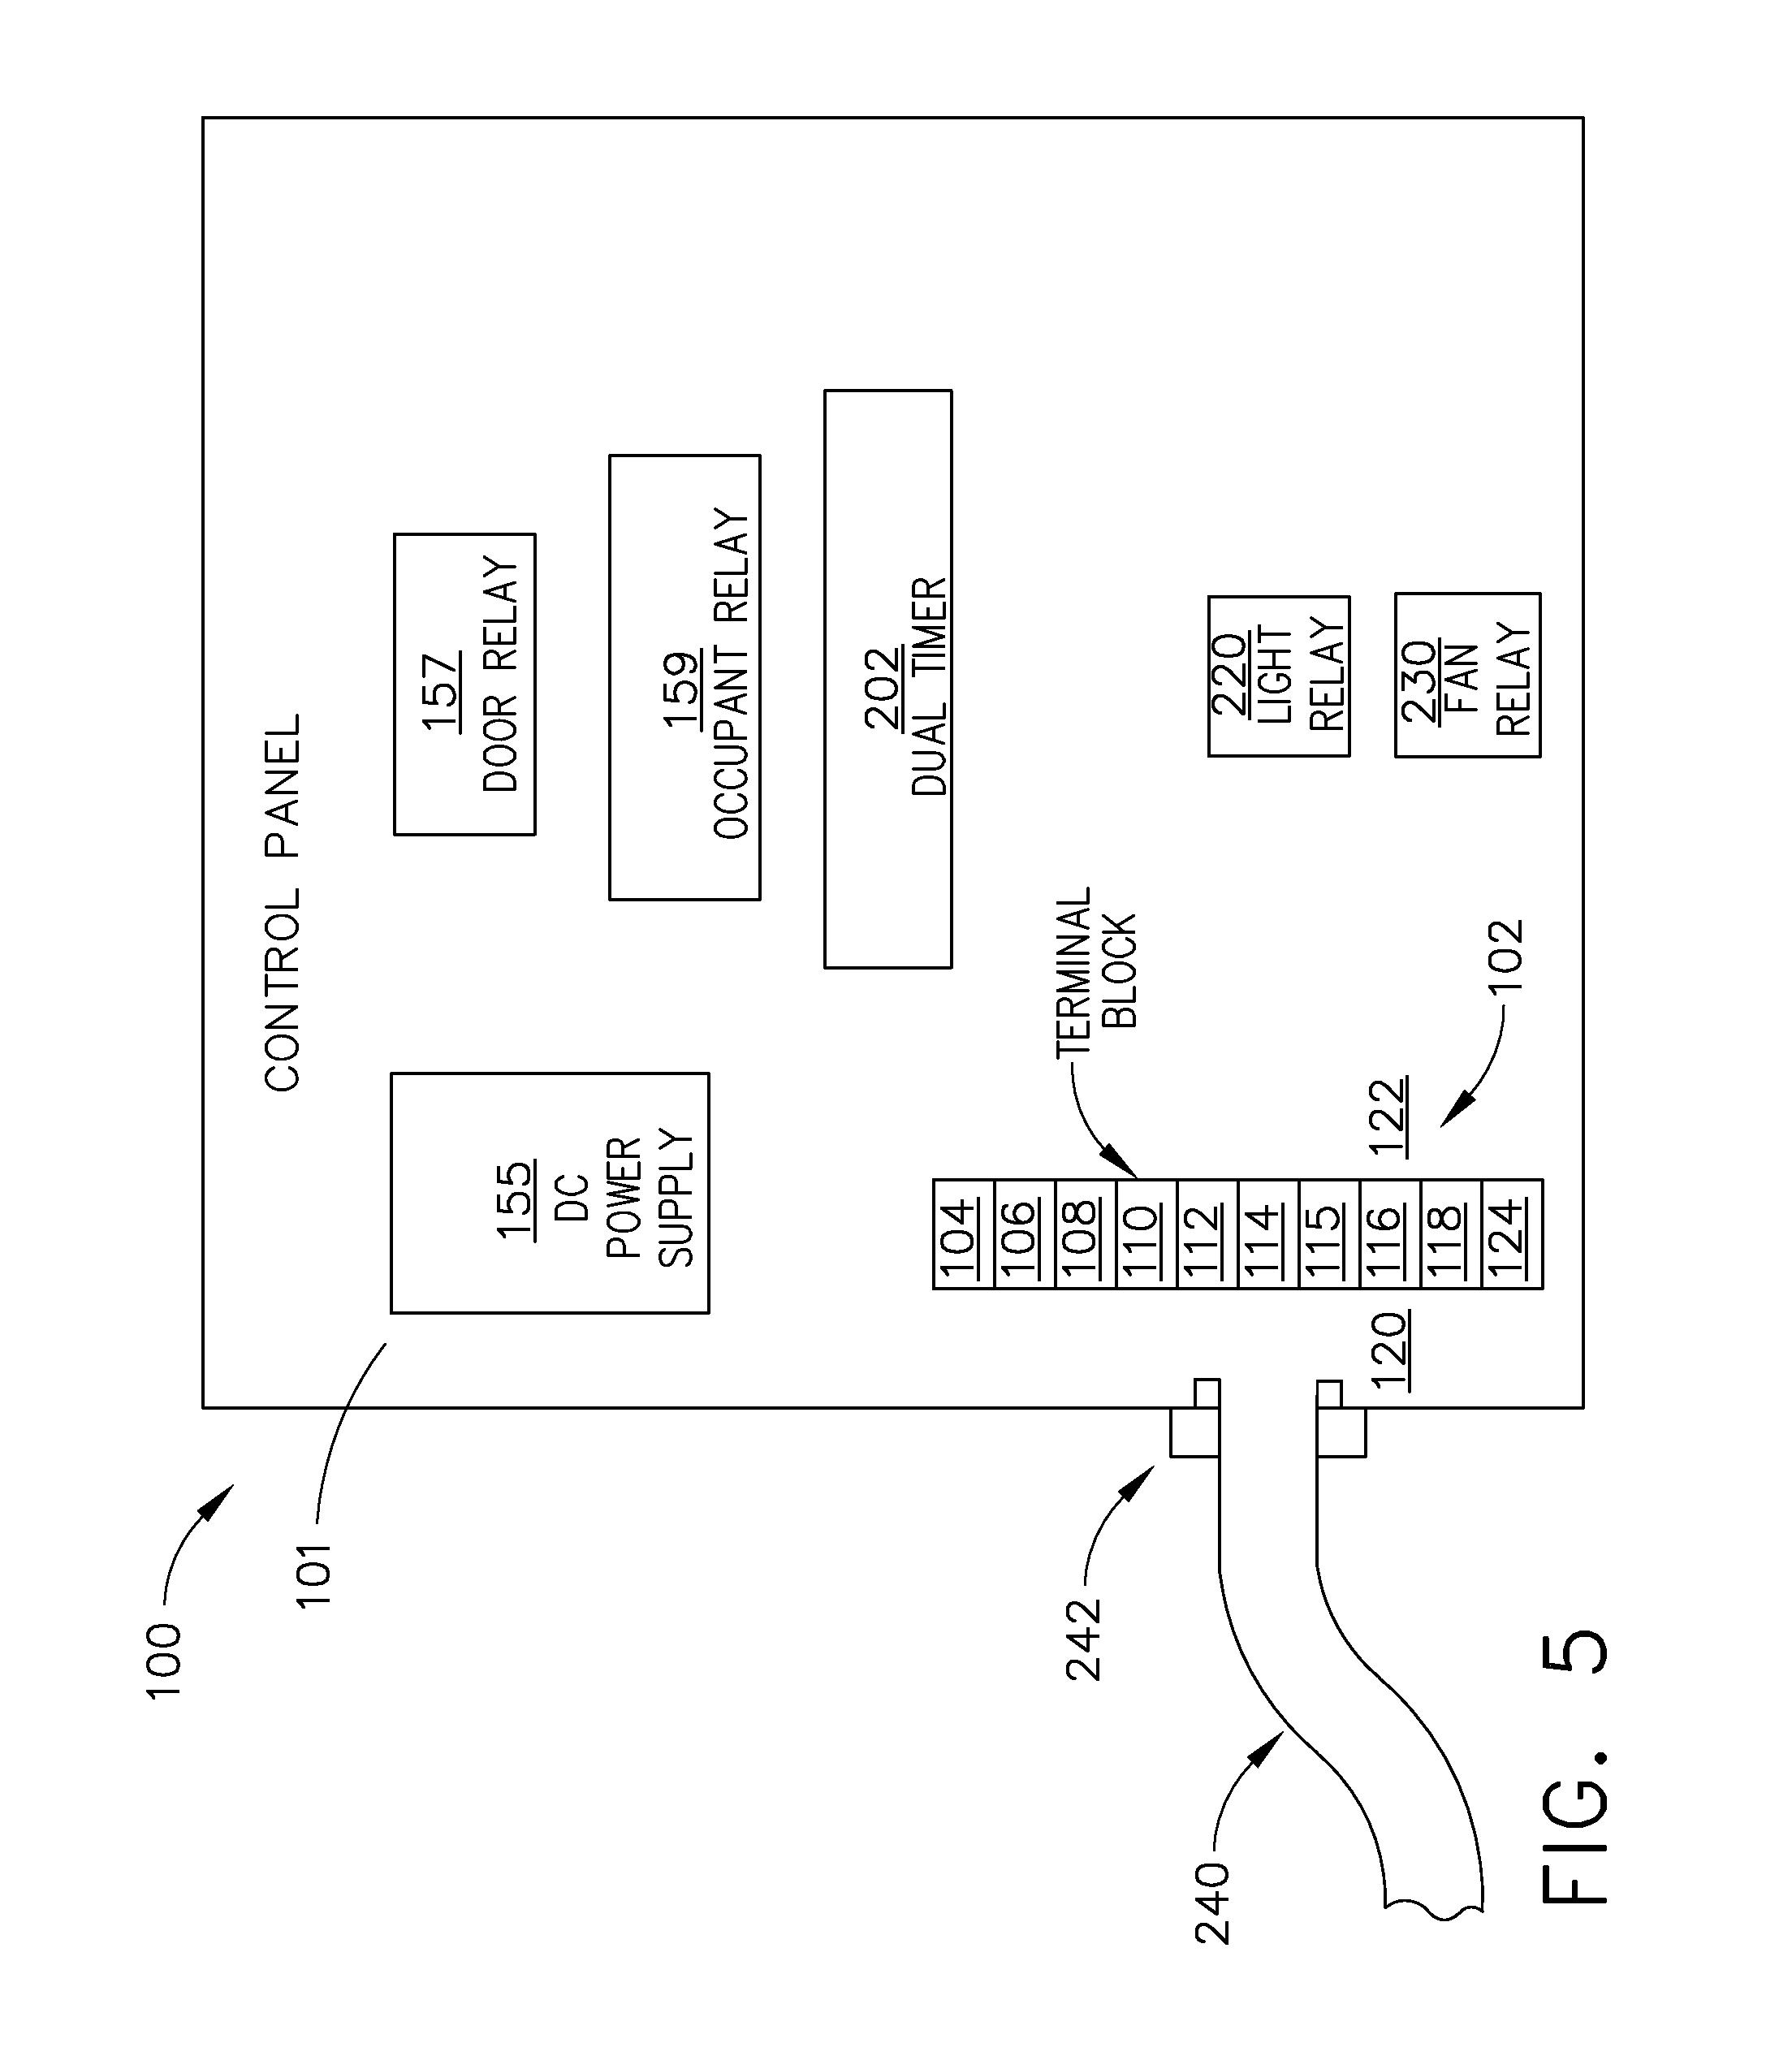 dover elevator controller wiring diagram elevator parts